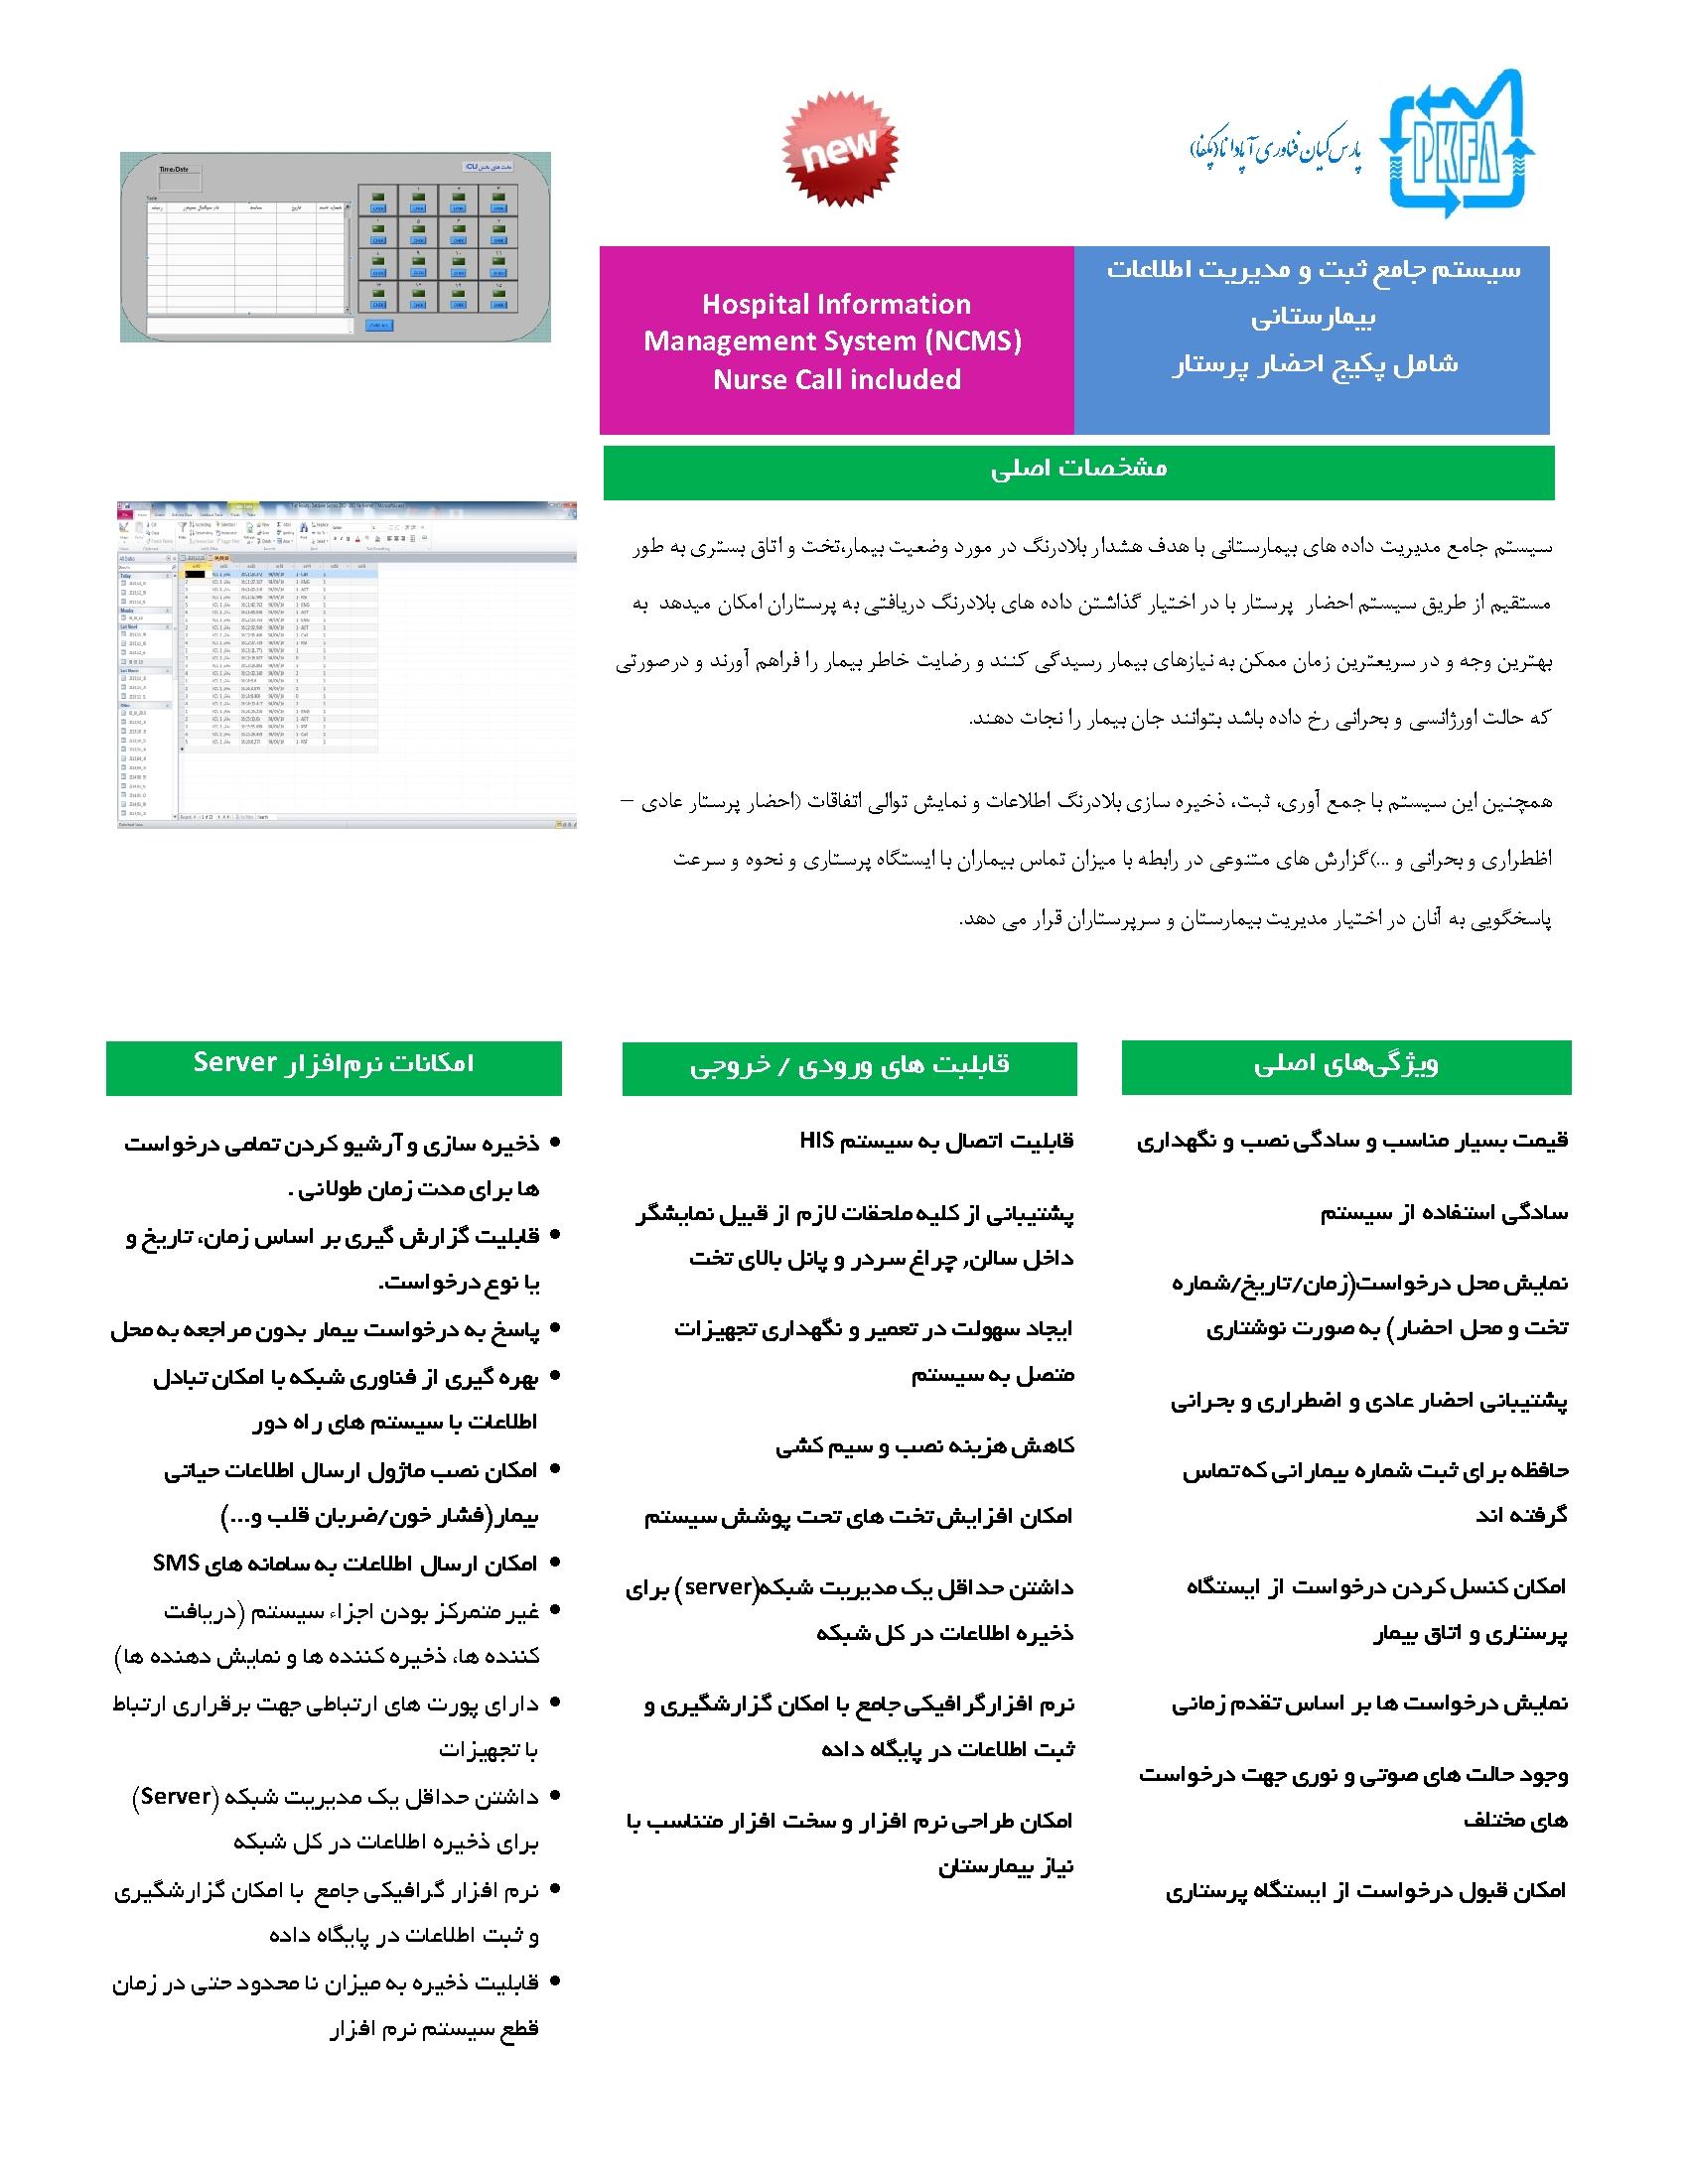 Microsoft Word - PKFA Catalog - NCMU - Rev 1 (1394-01)